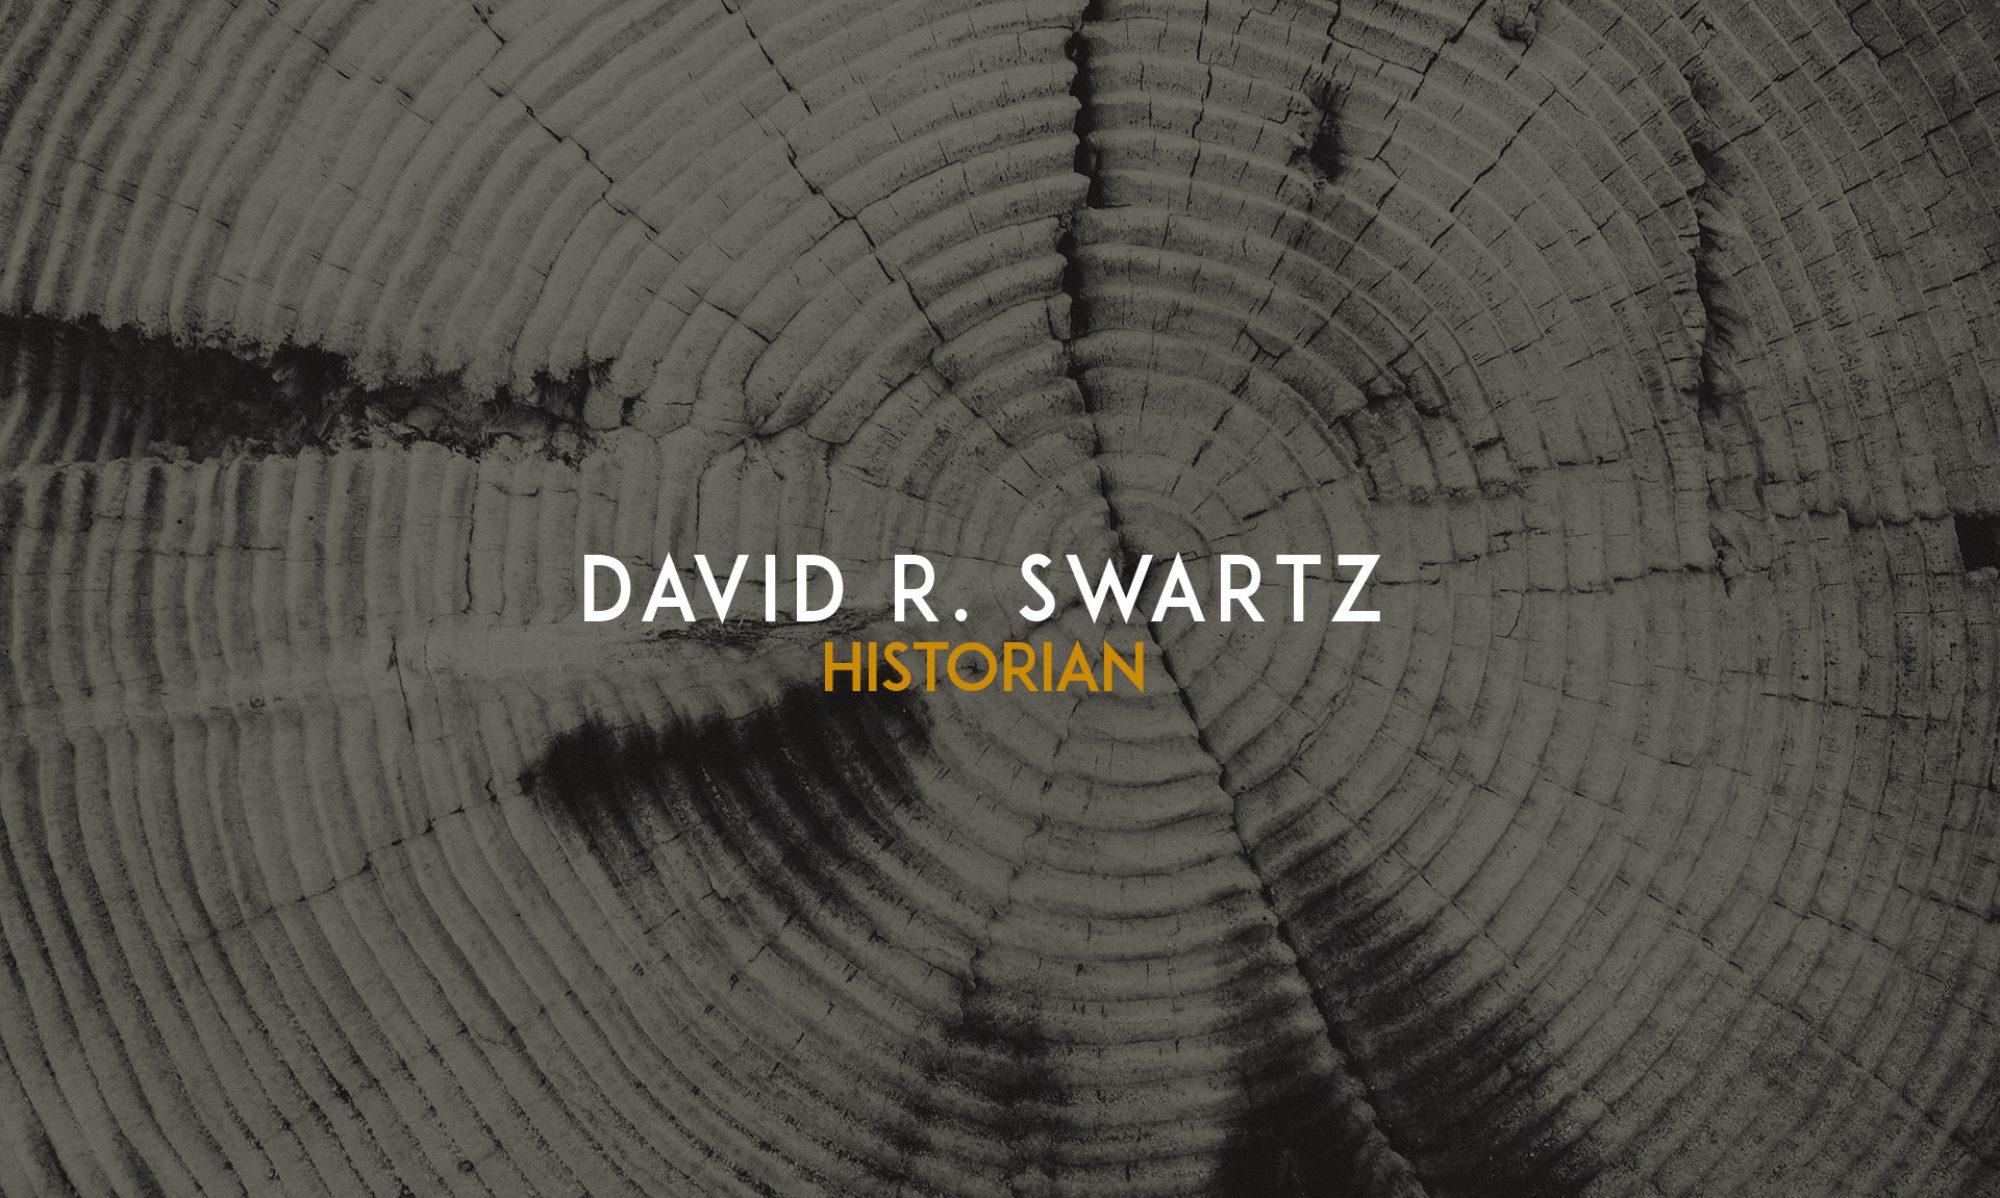 David R. Swartz